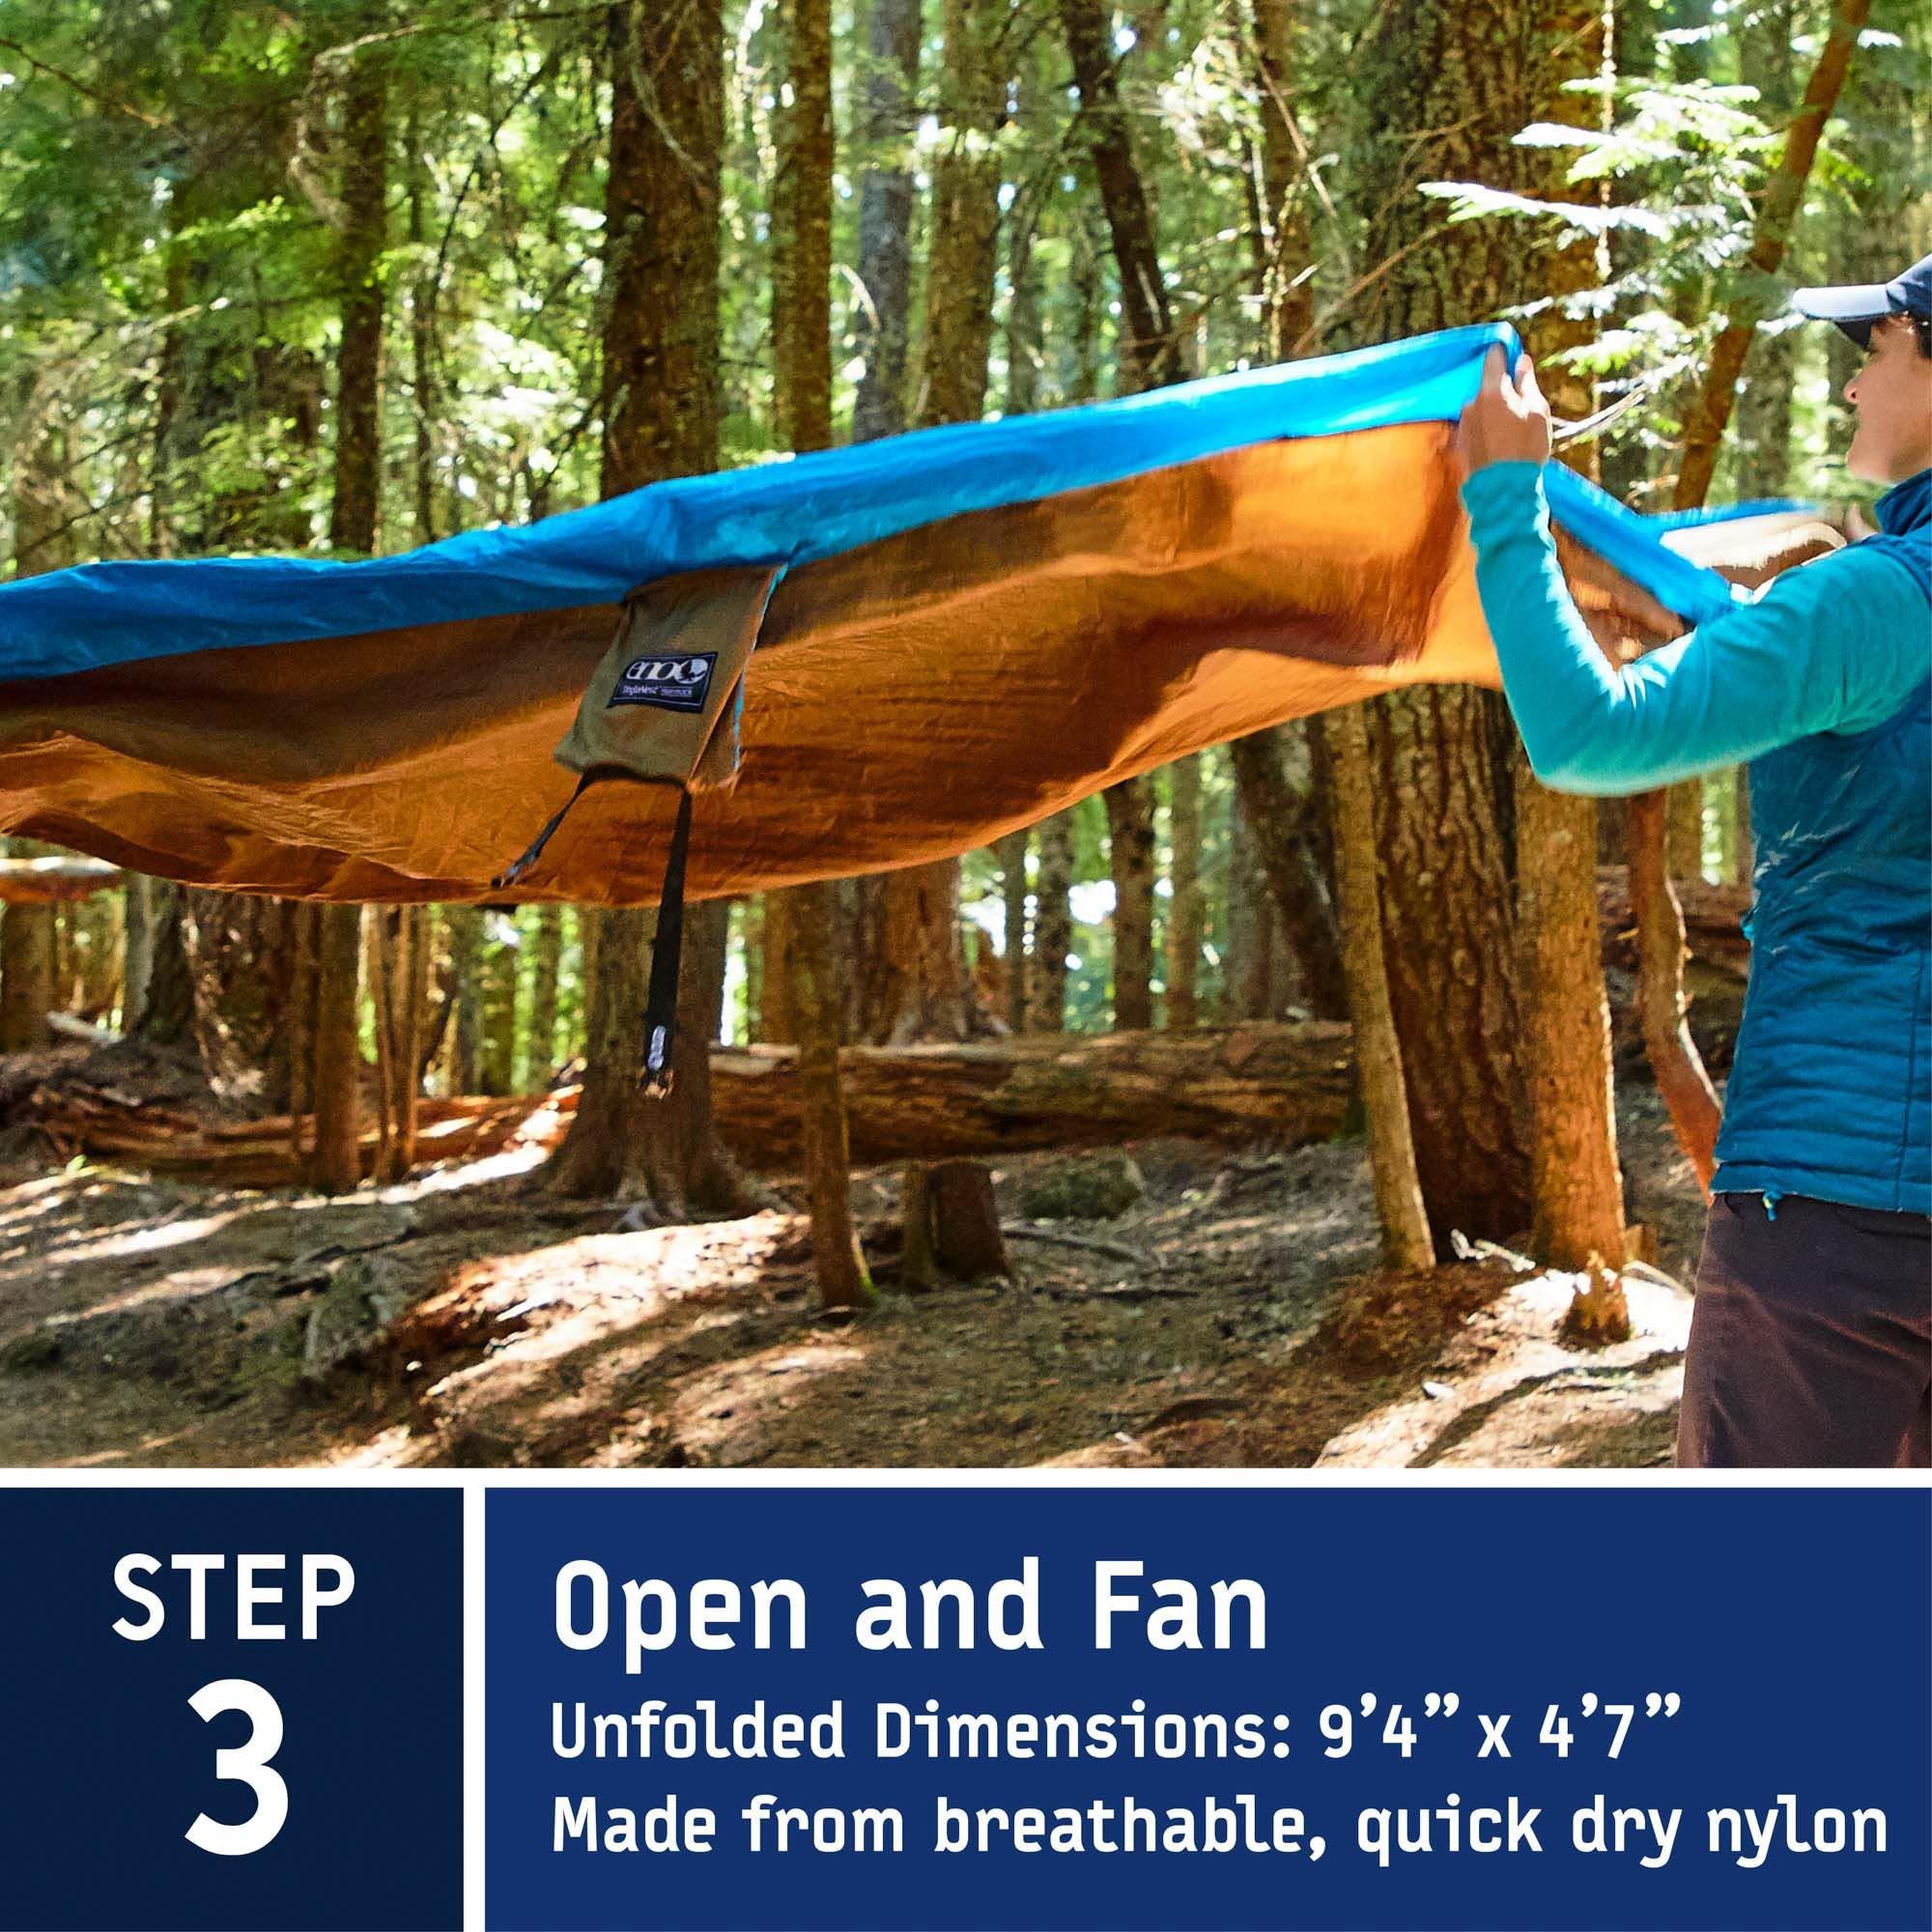 teal singlenest portable tibs one hammocks hammock product eagles nest outfitters eno khaki for automotive